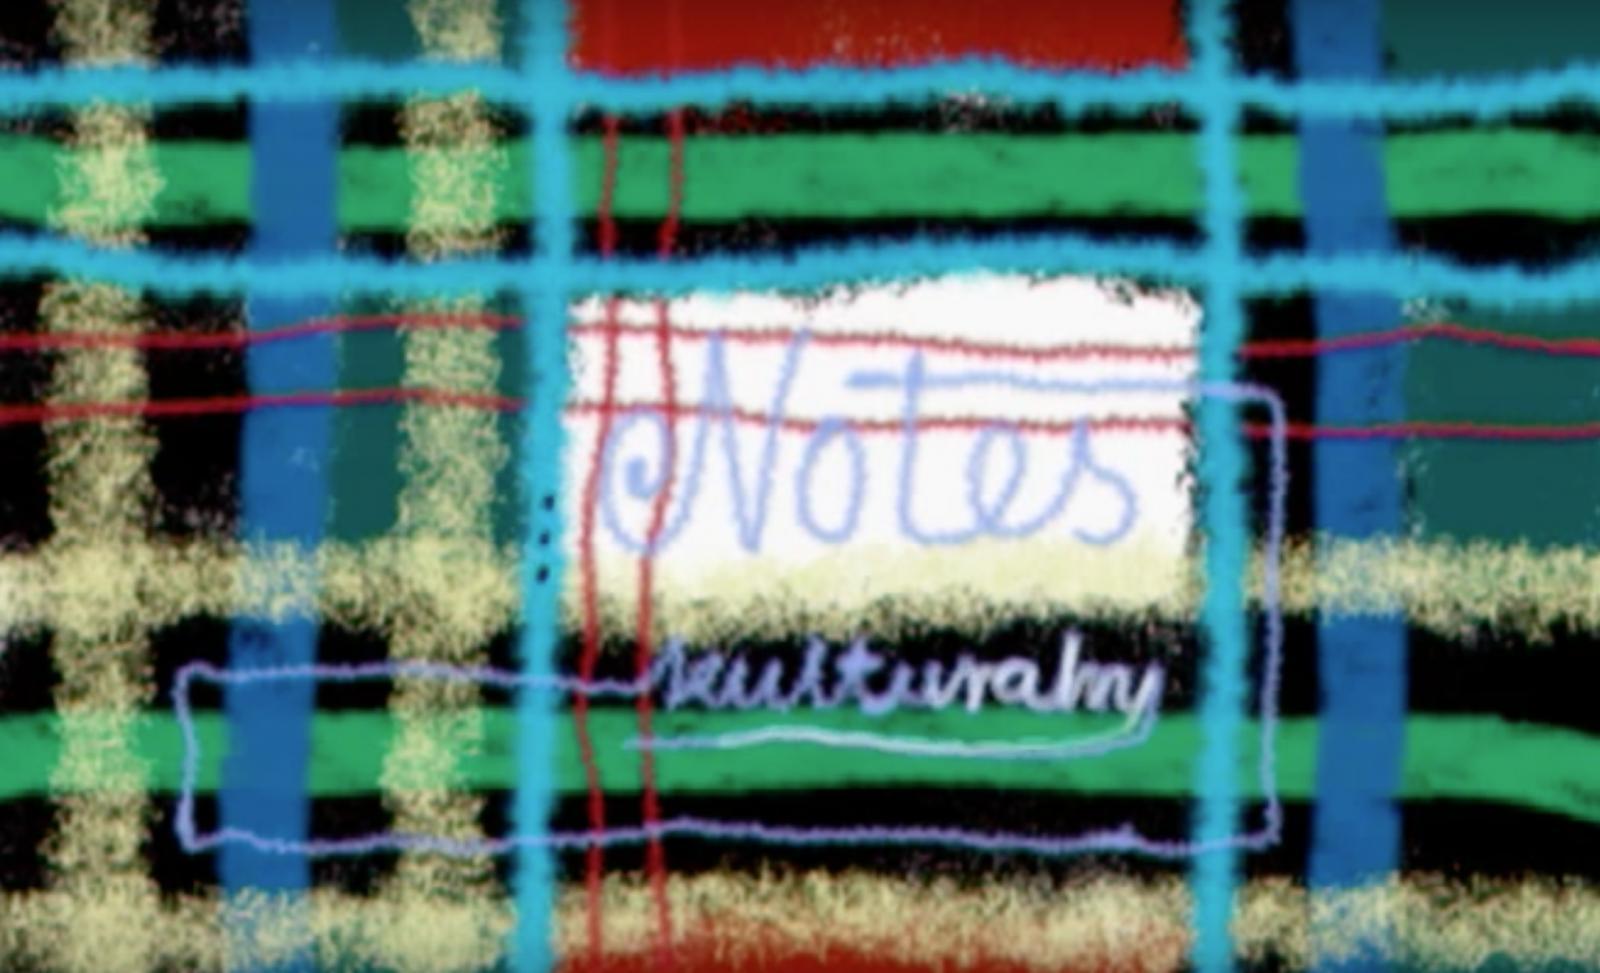 S. Stasiulewicz, Sean Noonan, Tim Dahl, Paul-Alexander Meurens - NOTES KULTURALNY, odc. 4